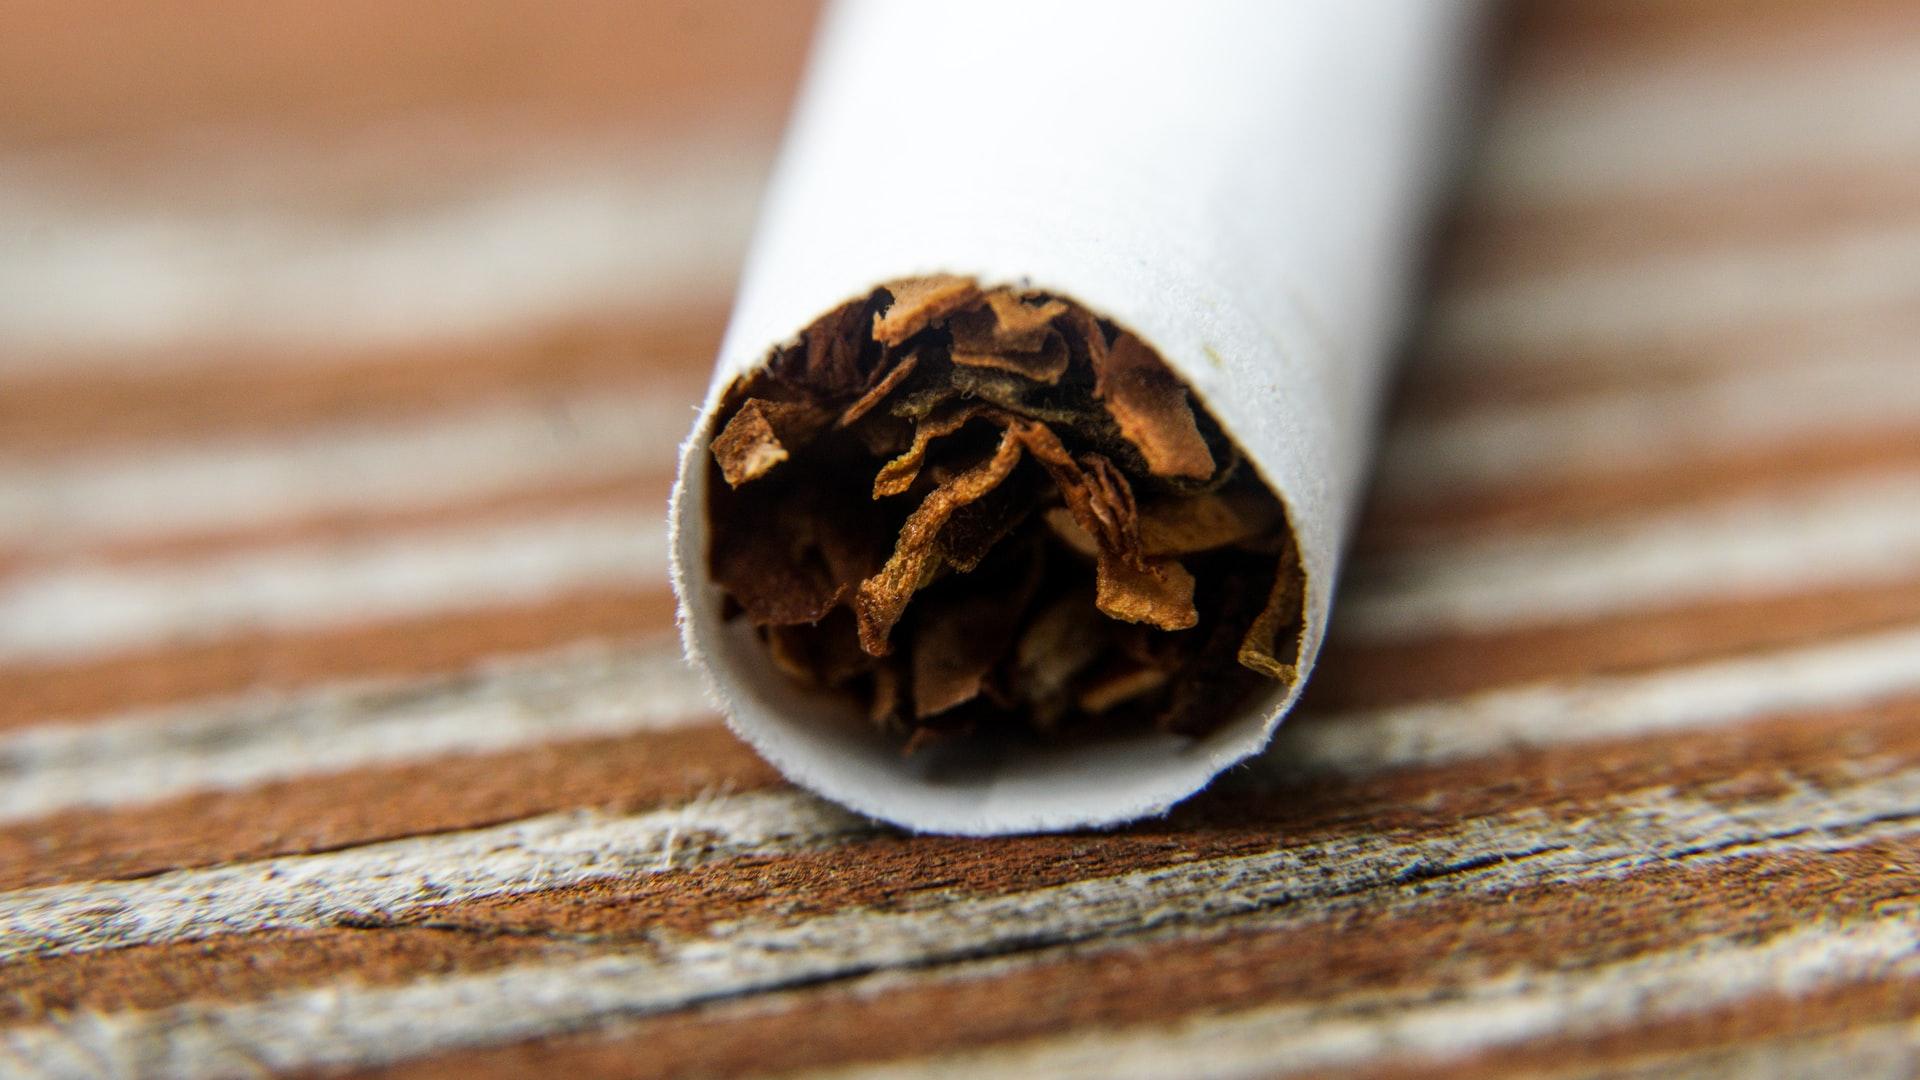 Cigarette Tip